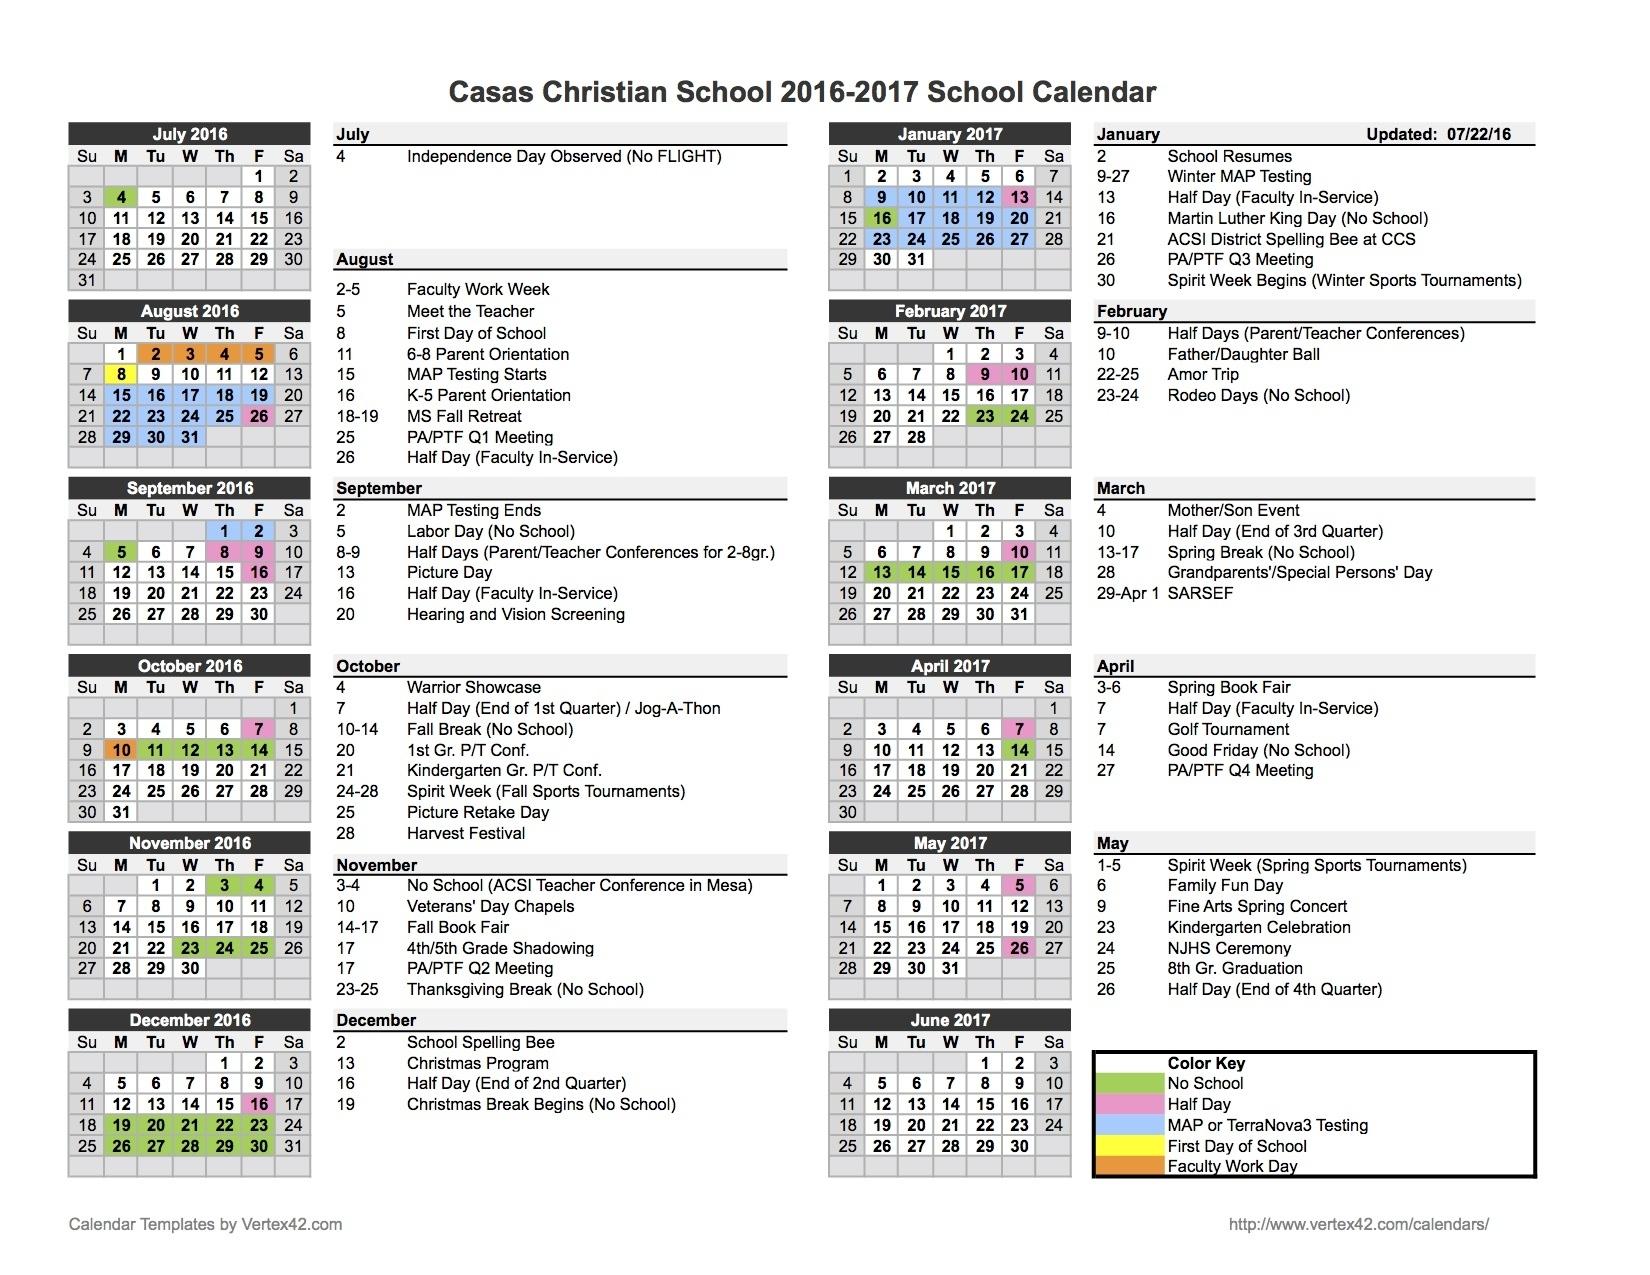 School Calendar - Casas Christian School Exceptional 9 Week School Calendar